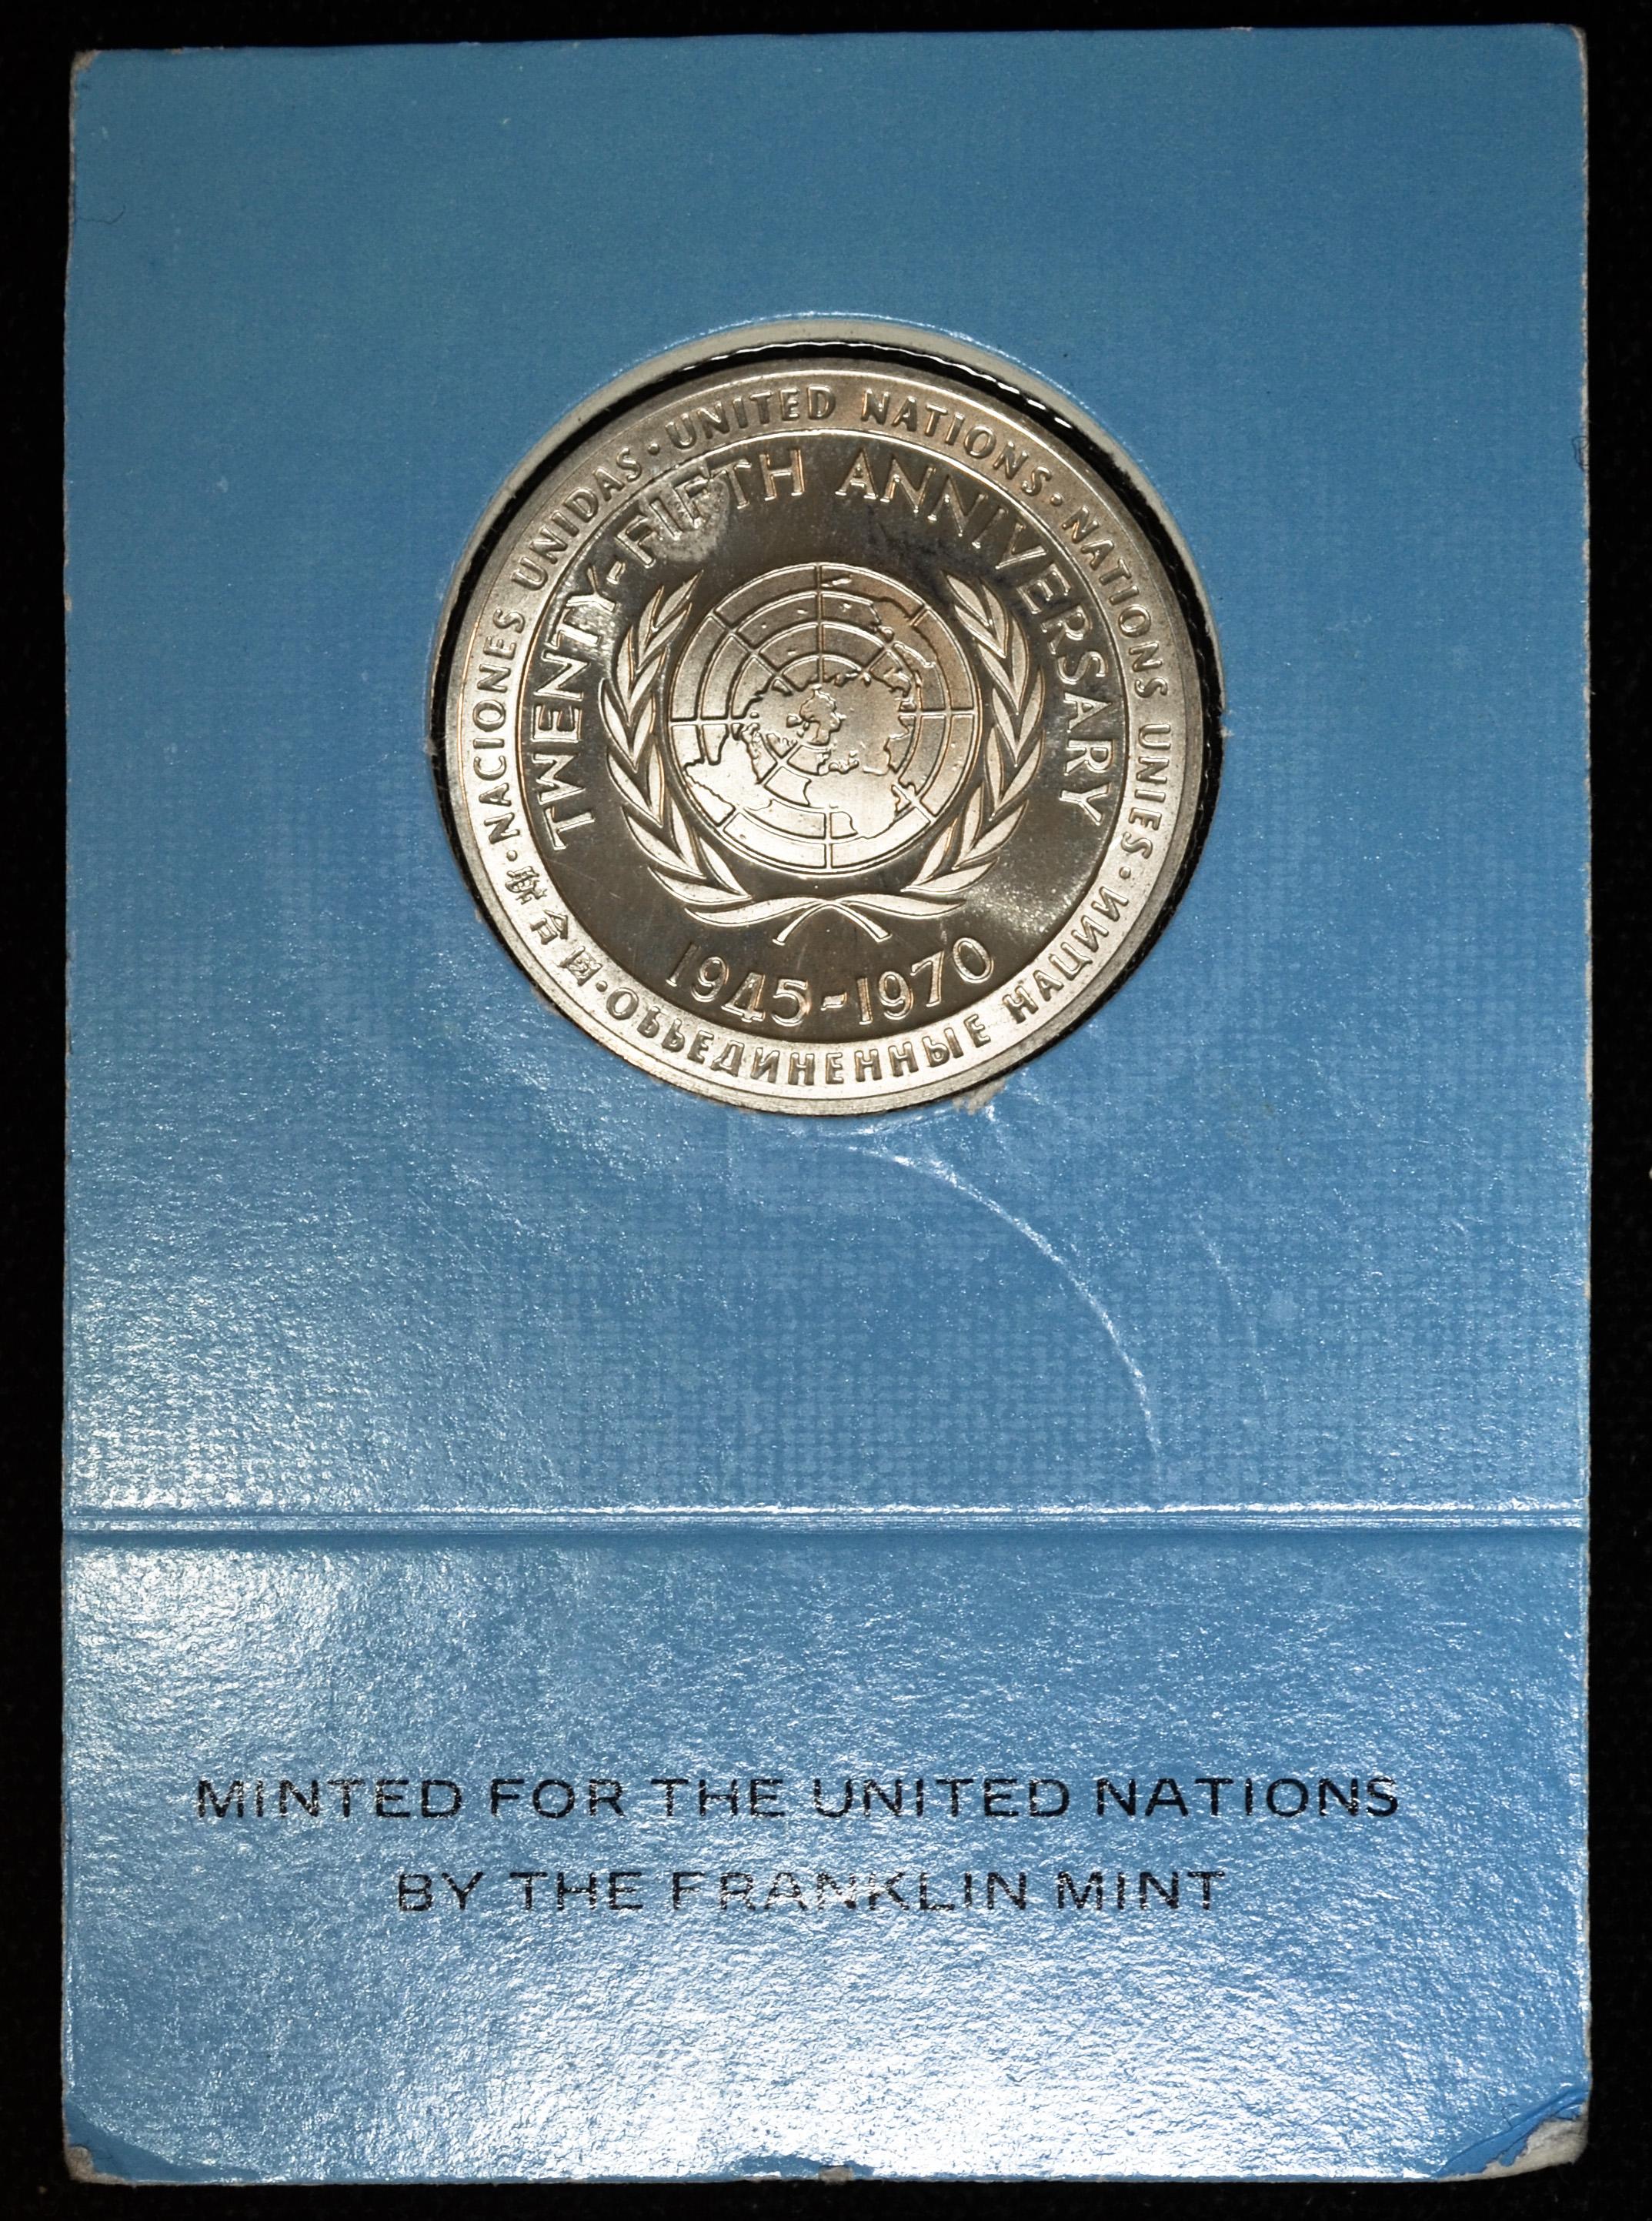 Franklin Mint United Nations Sterling Silver Proof Medal